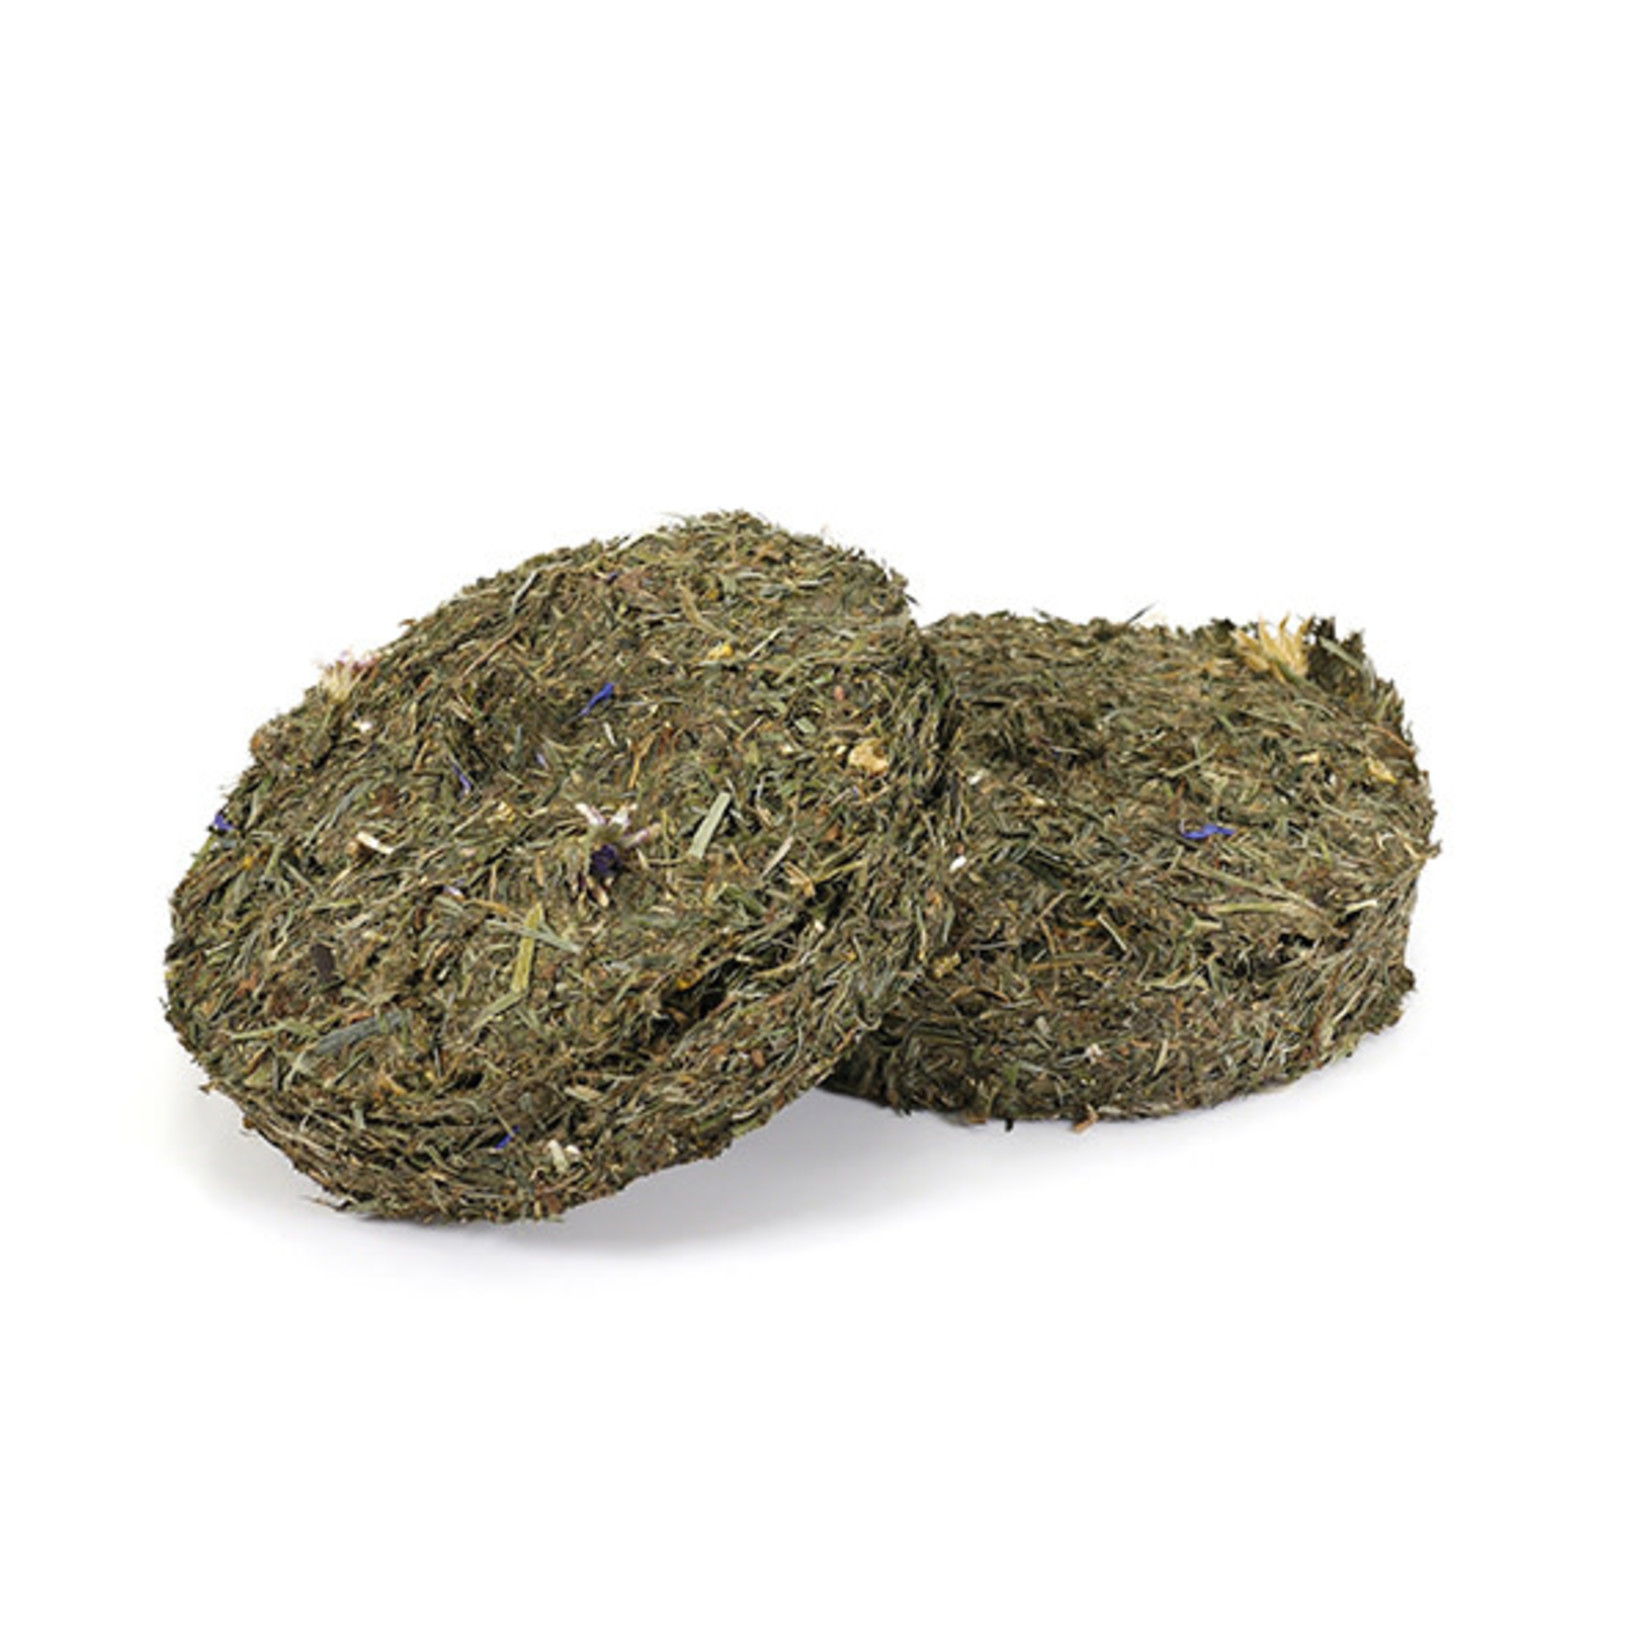 Rosewood Boredom Breaker Naturals Herb 'n' Hay Wheels Small Animal Treat, 2 pack